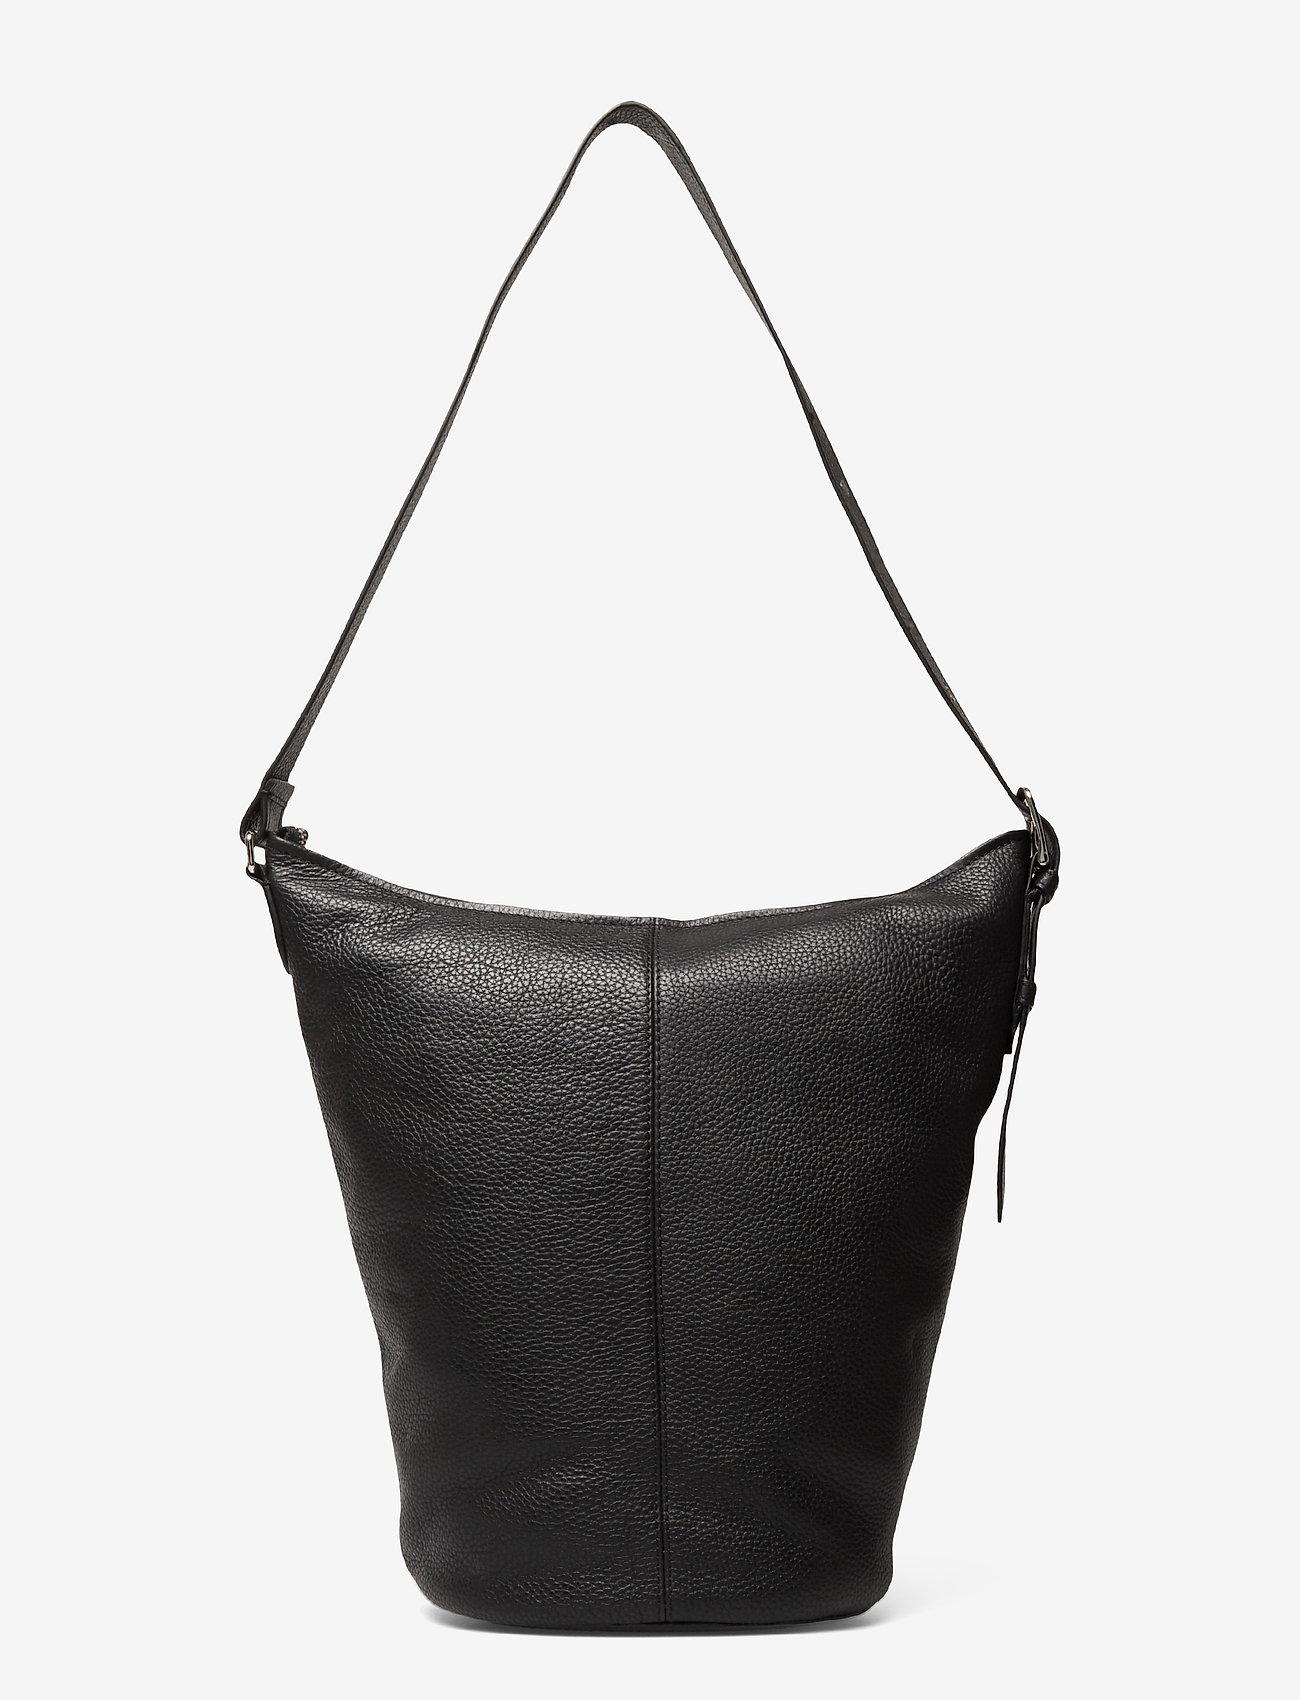 Tiger of Sweden - ABELIA - bucket bags - black - 1